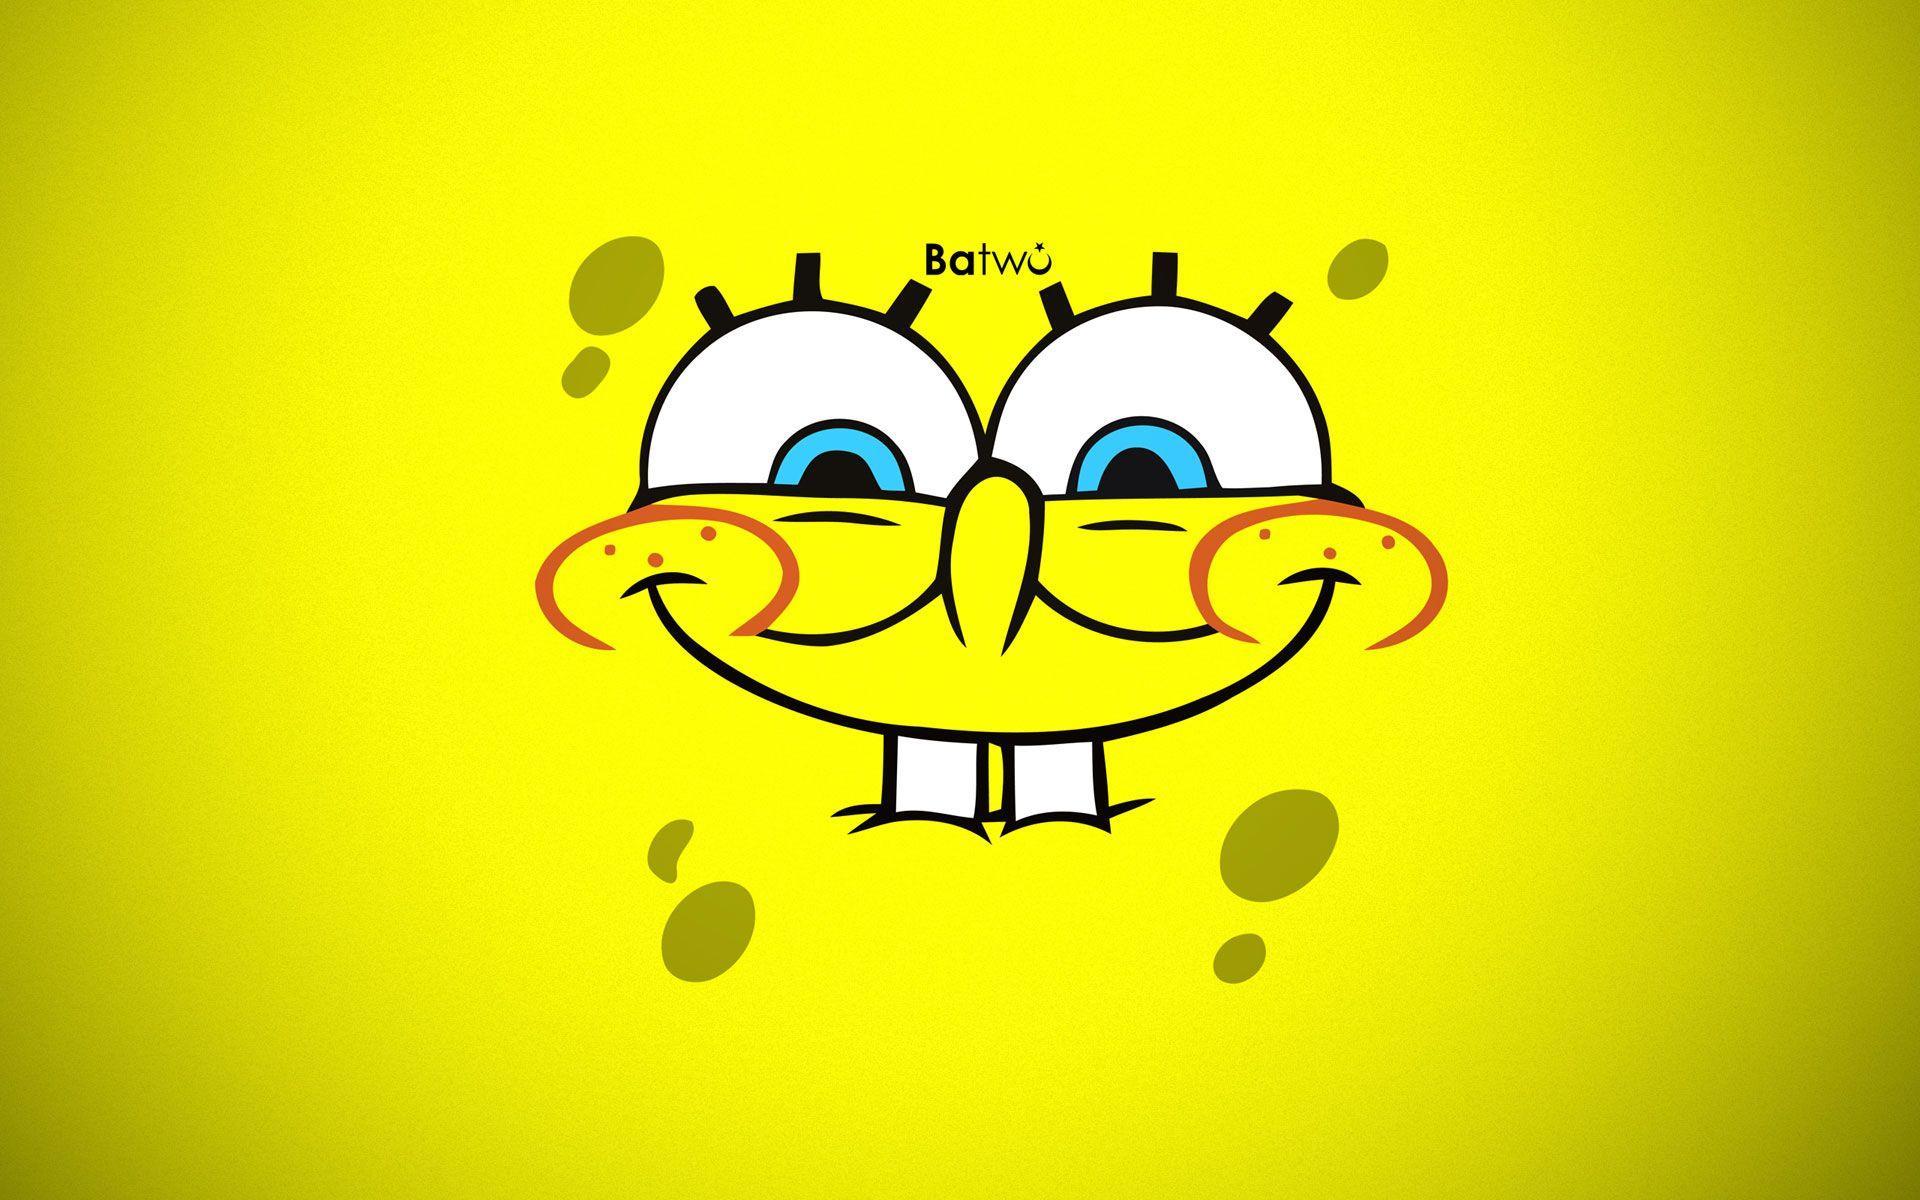 Spongebob Squarepants Hd Wallpapers Wallpaper Cave